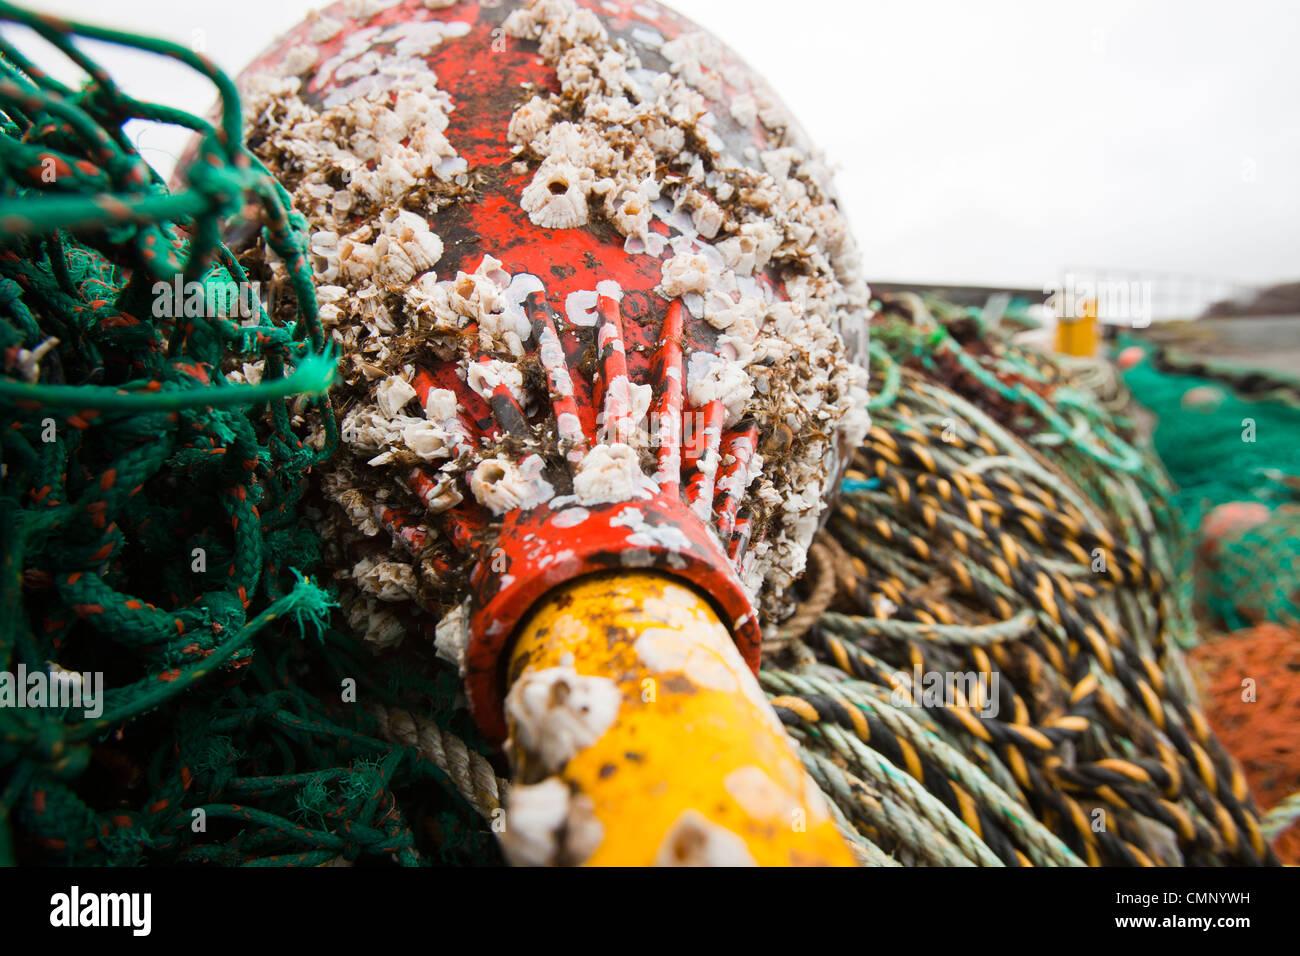 Fishing gear on the harbour at Portnalong, Isle of skye, Scotland, UK. Stock Photo